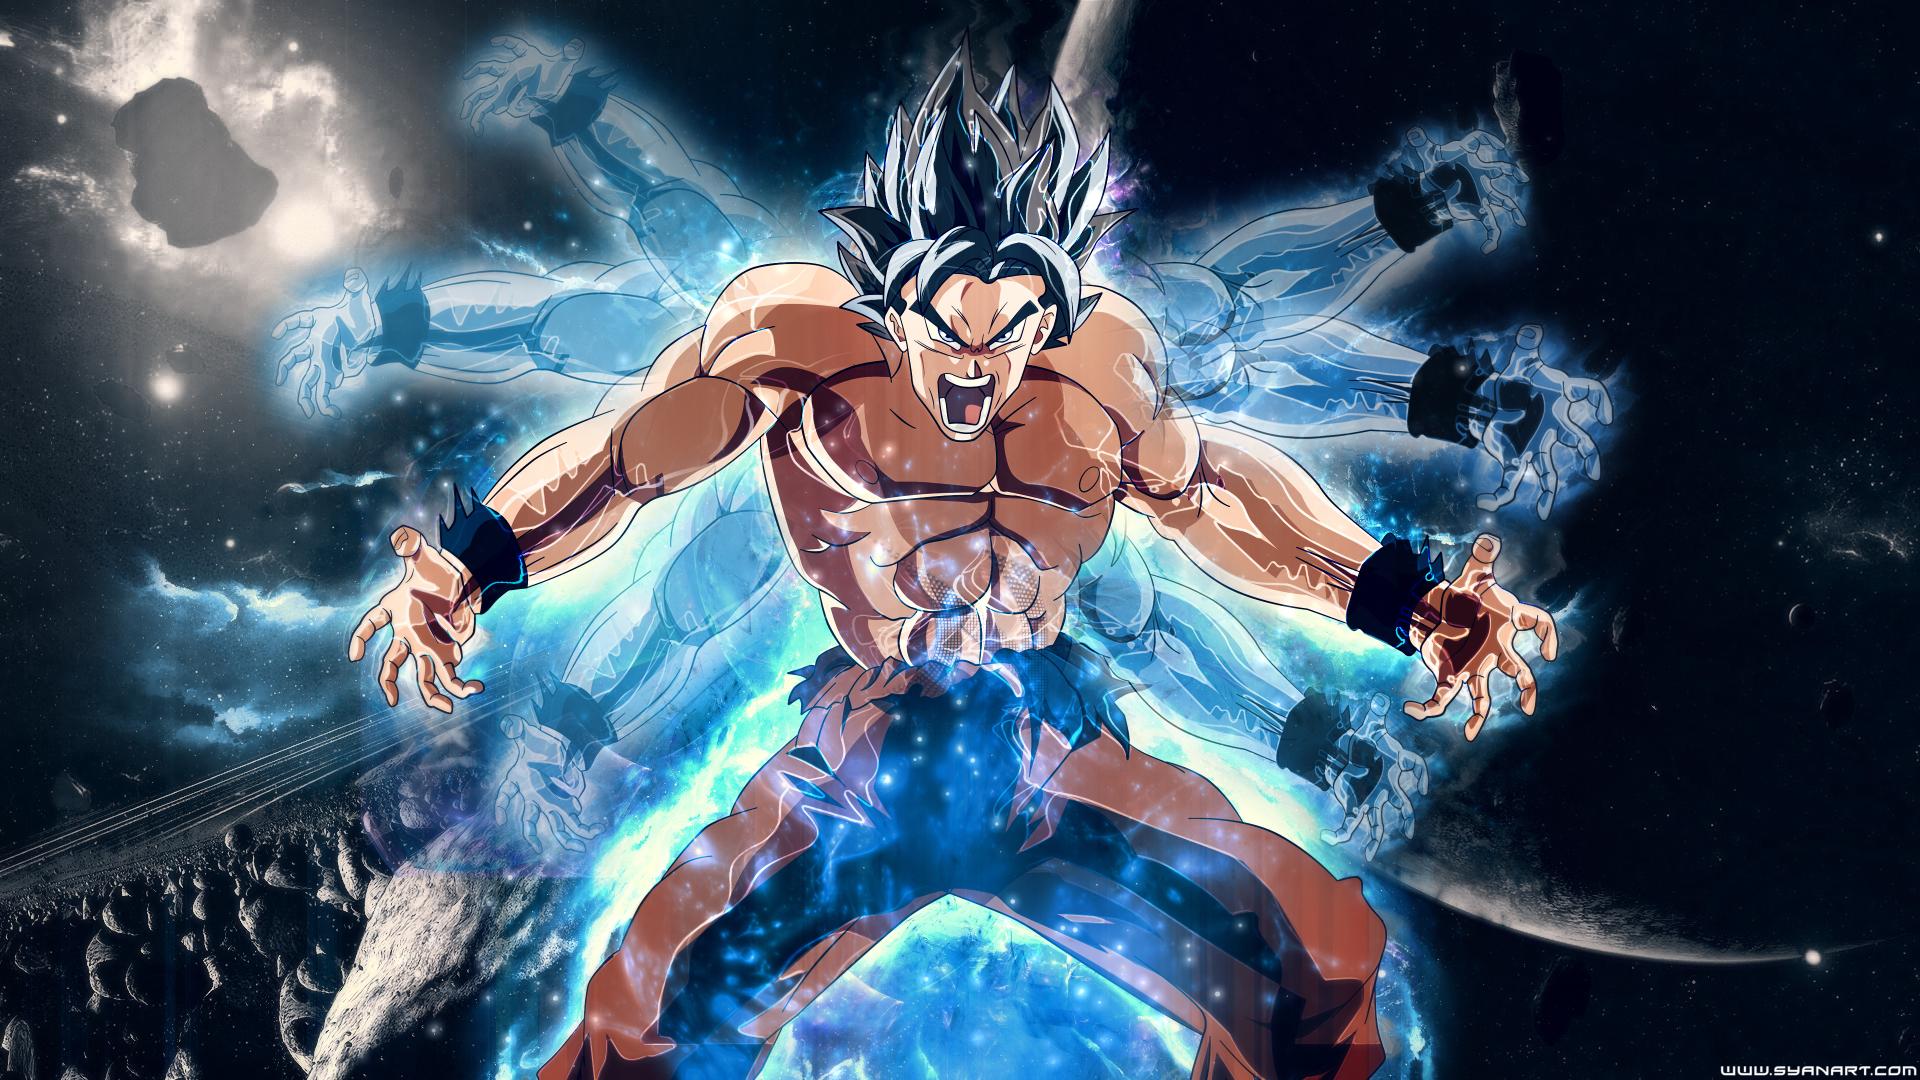 Epic Dbz Wallpapers High Resolution: Dragon Ball Super Goku Angry, HD 4K Wallpaper